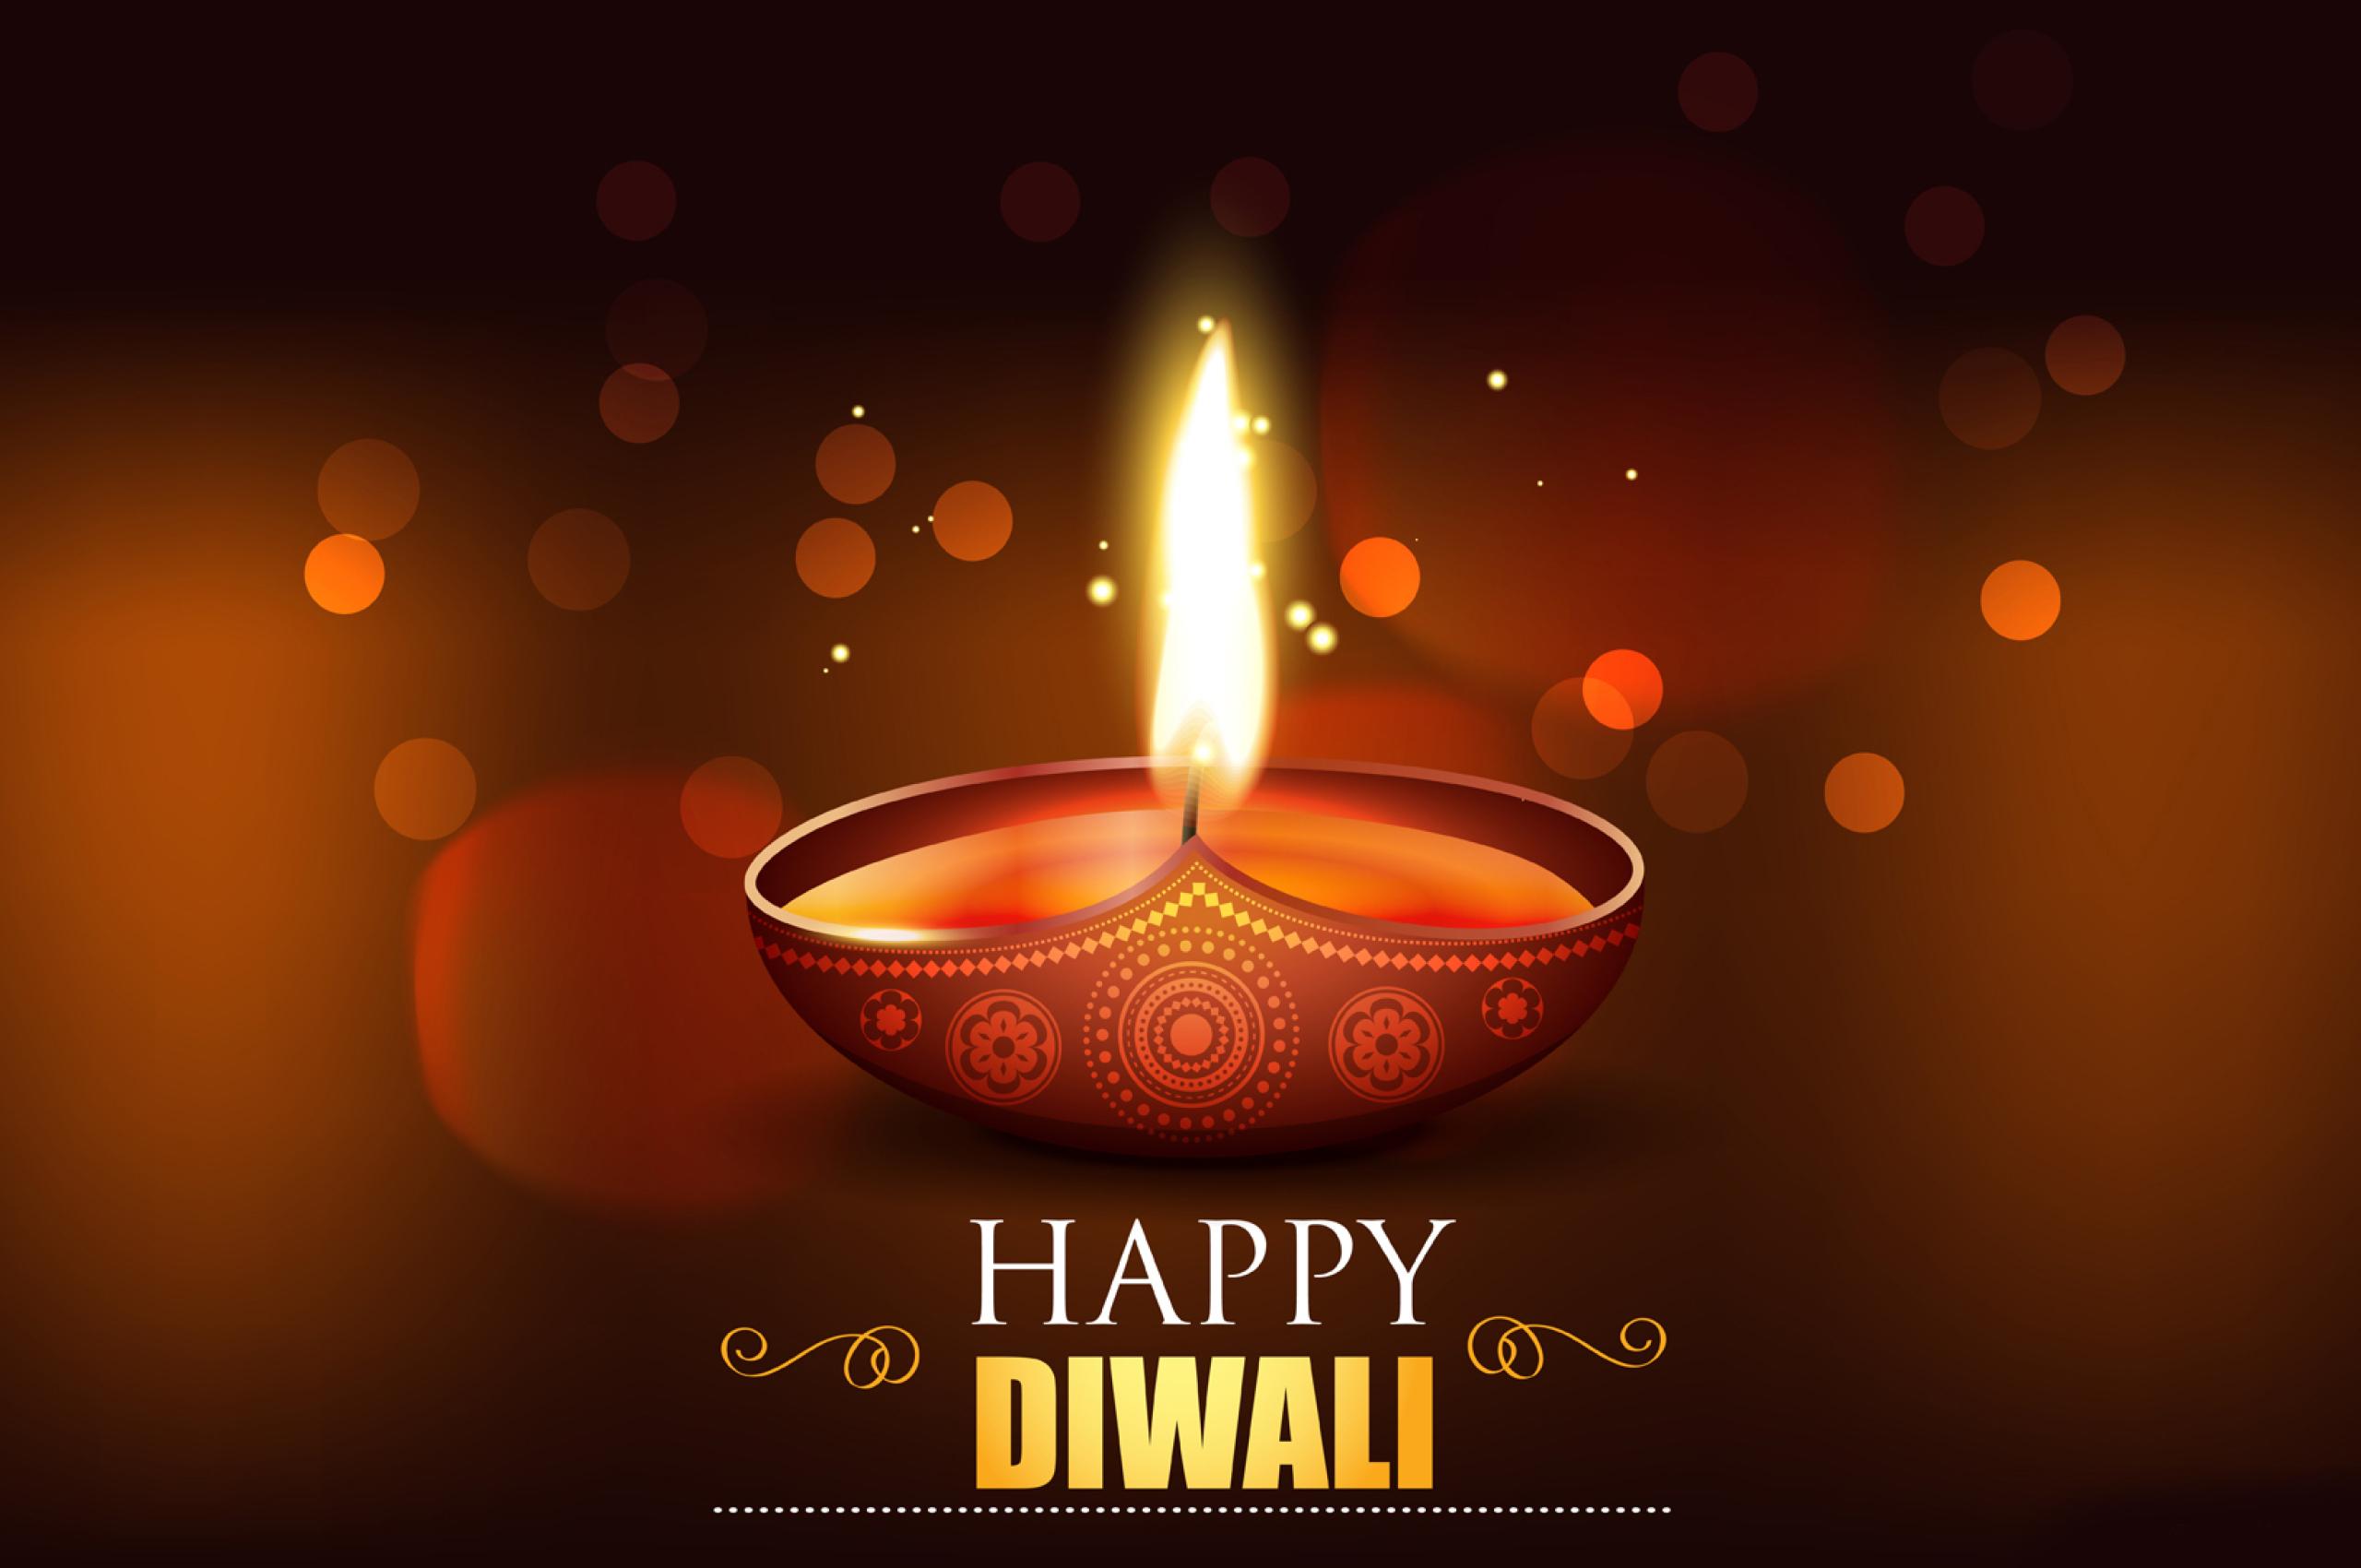 Happy Diwali 2020 Wallpaper in 2560x1700 Resolution